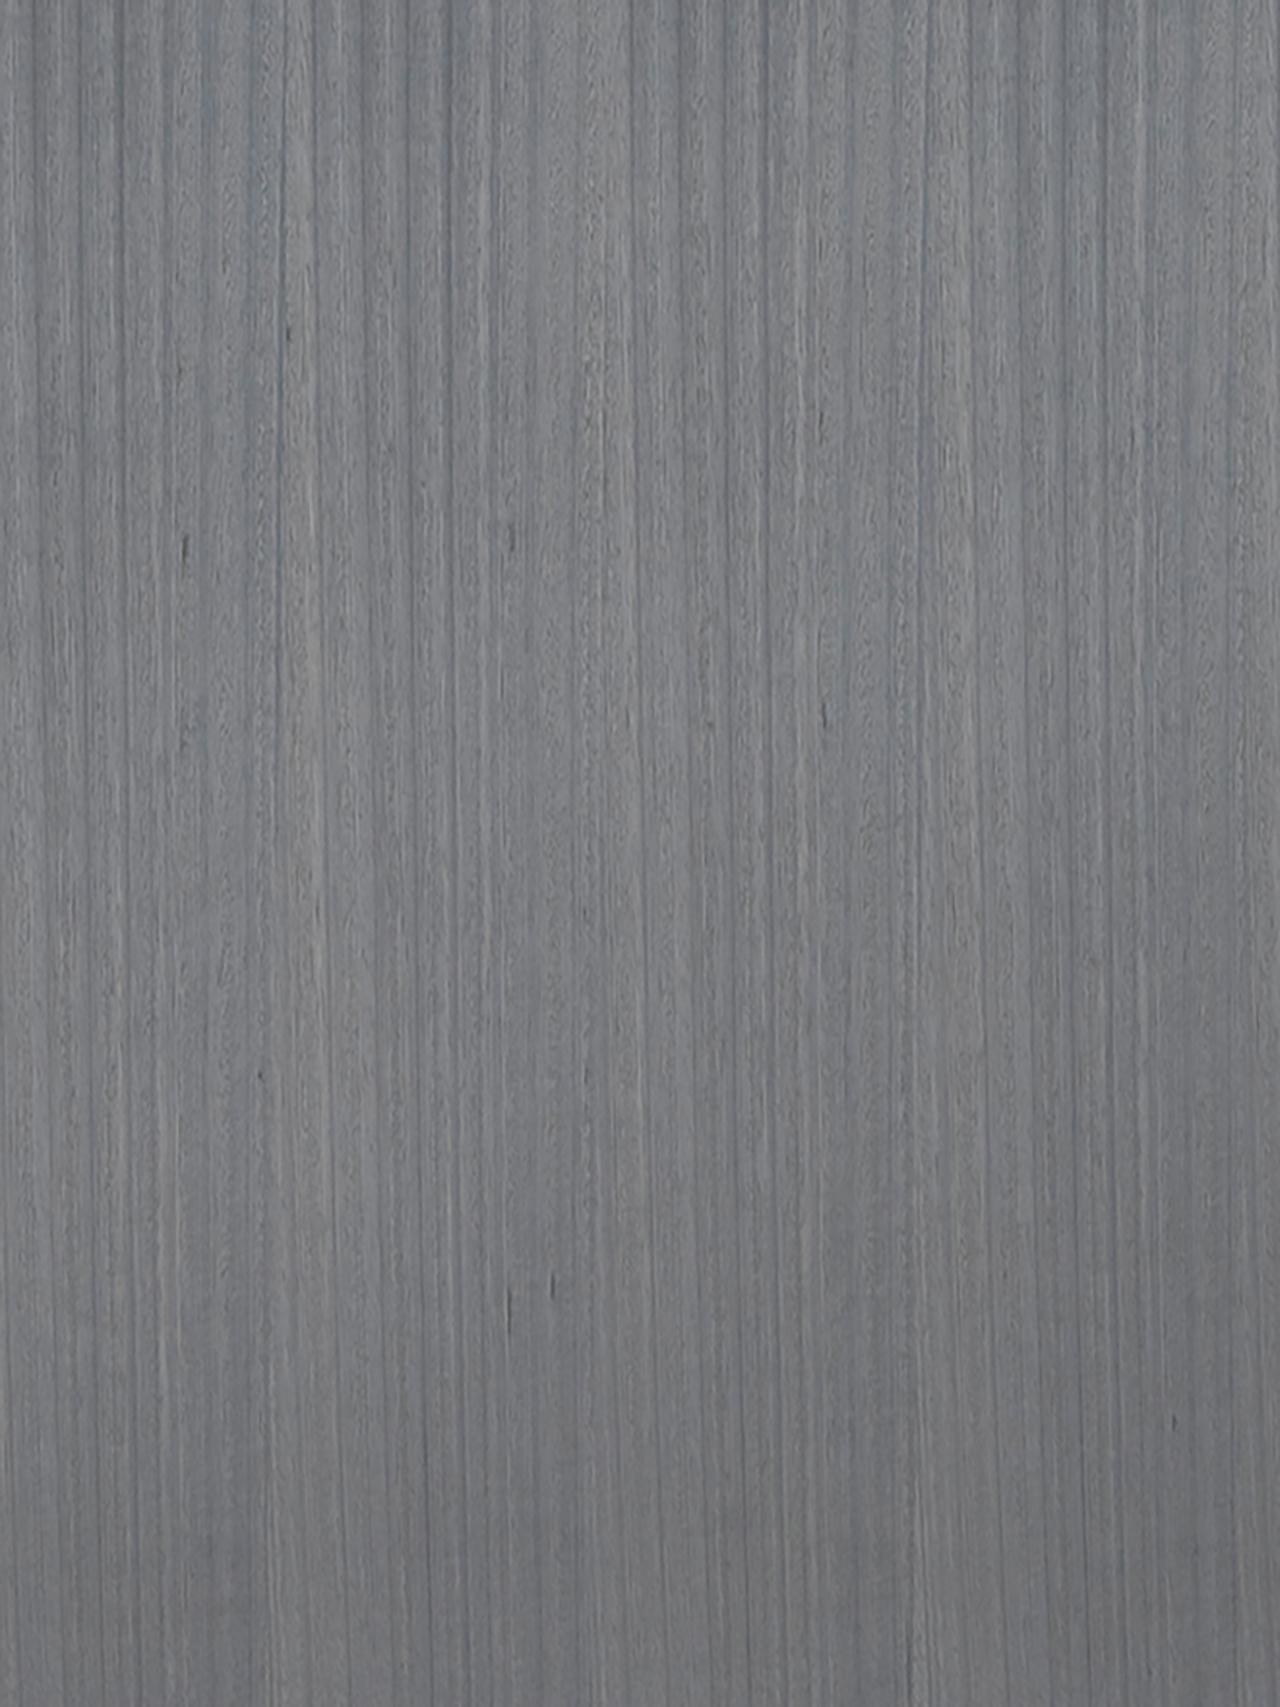 Grey Dyed Eucalyptus